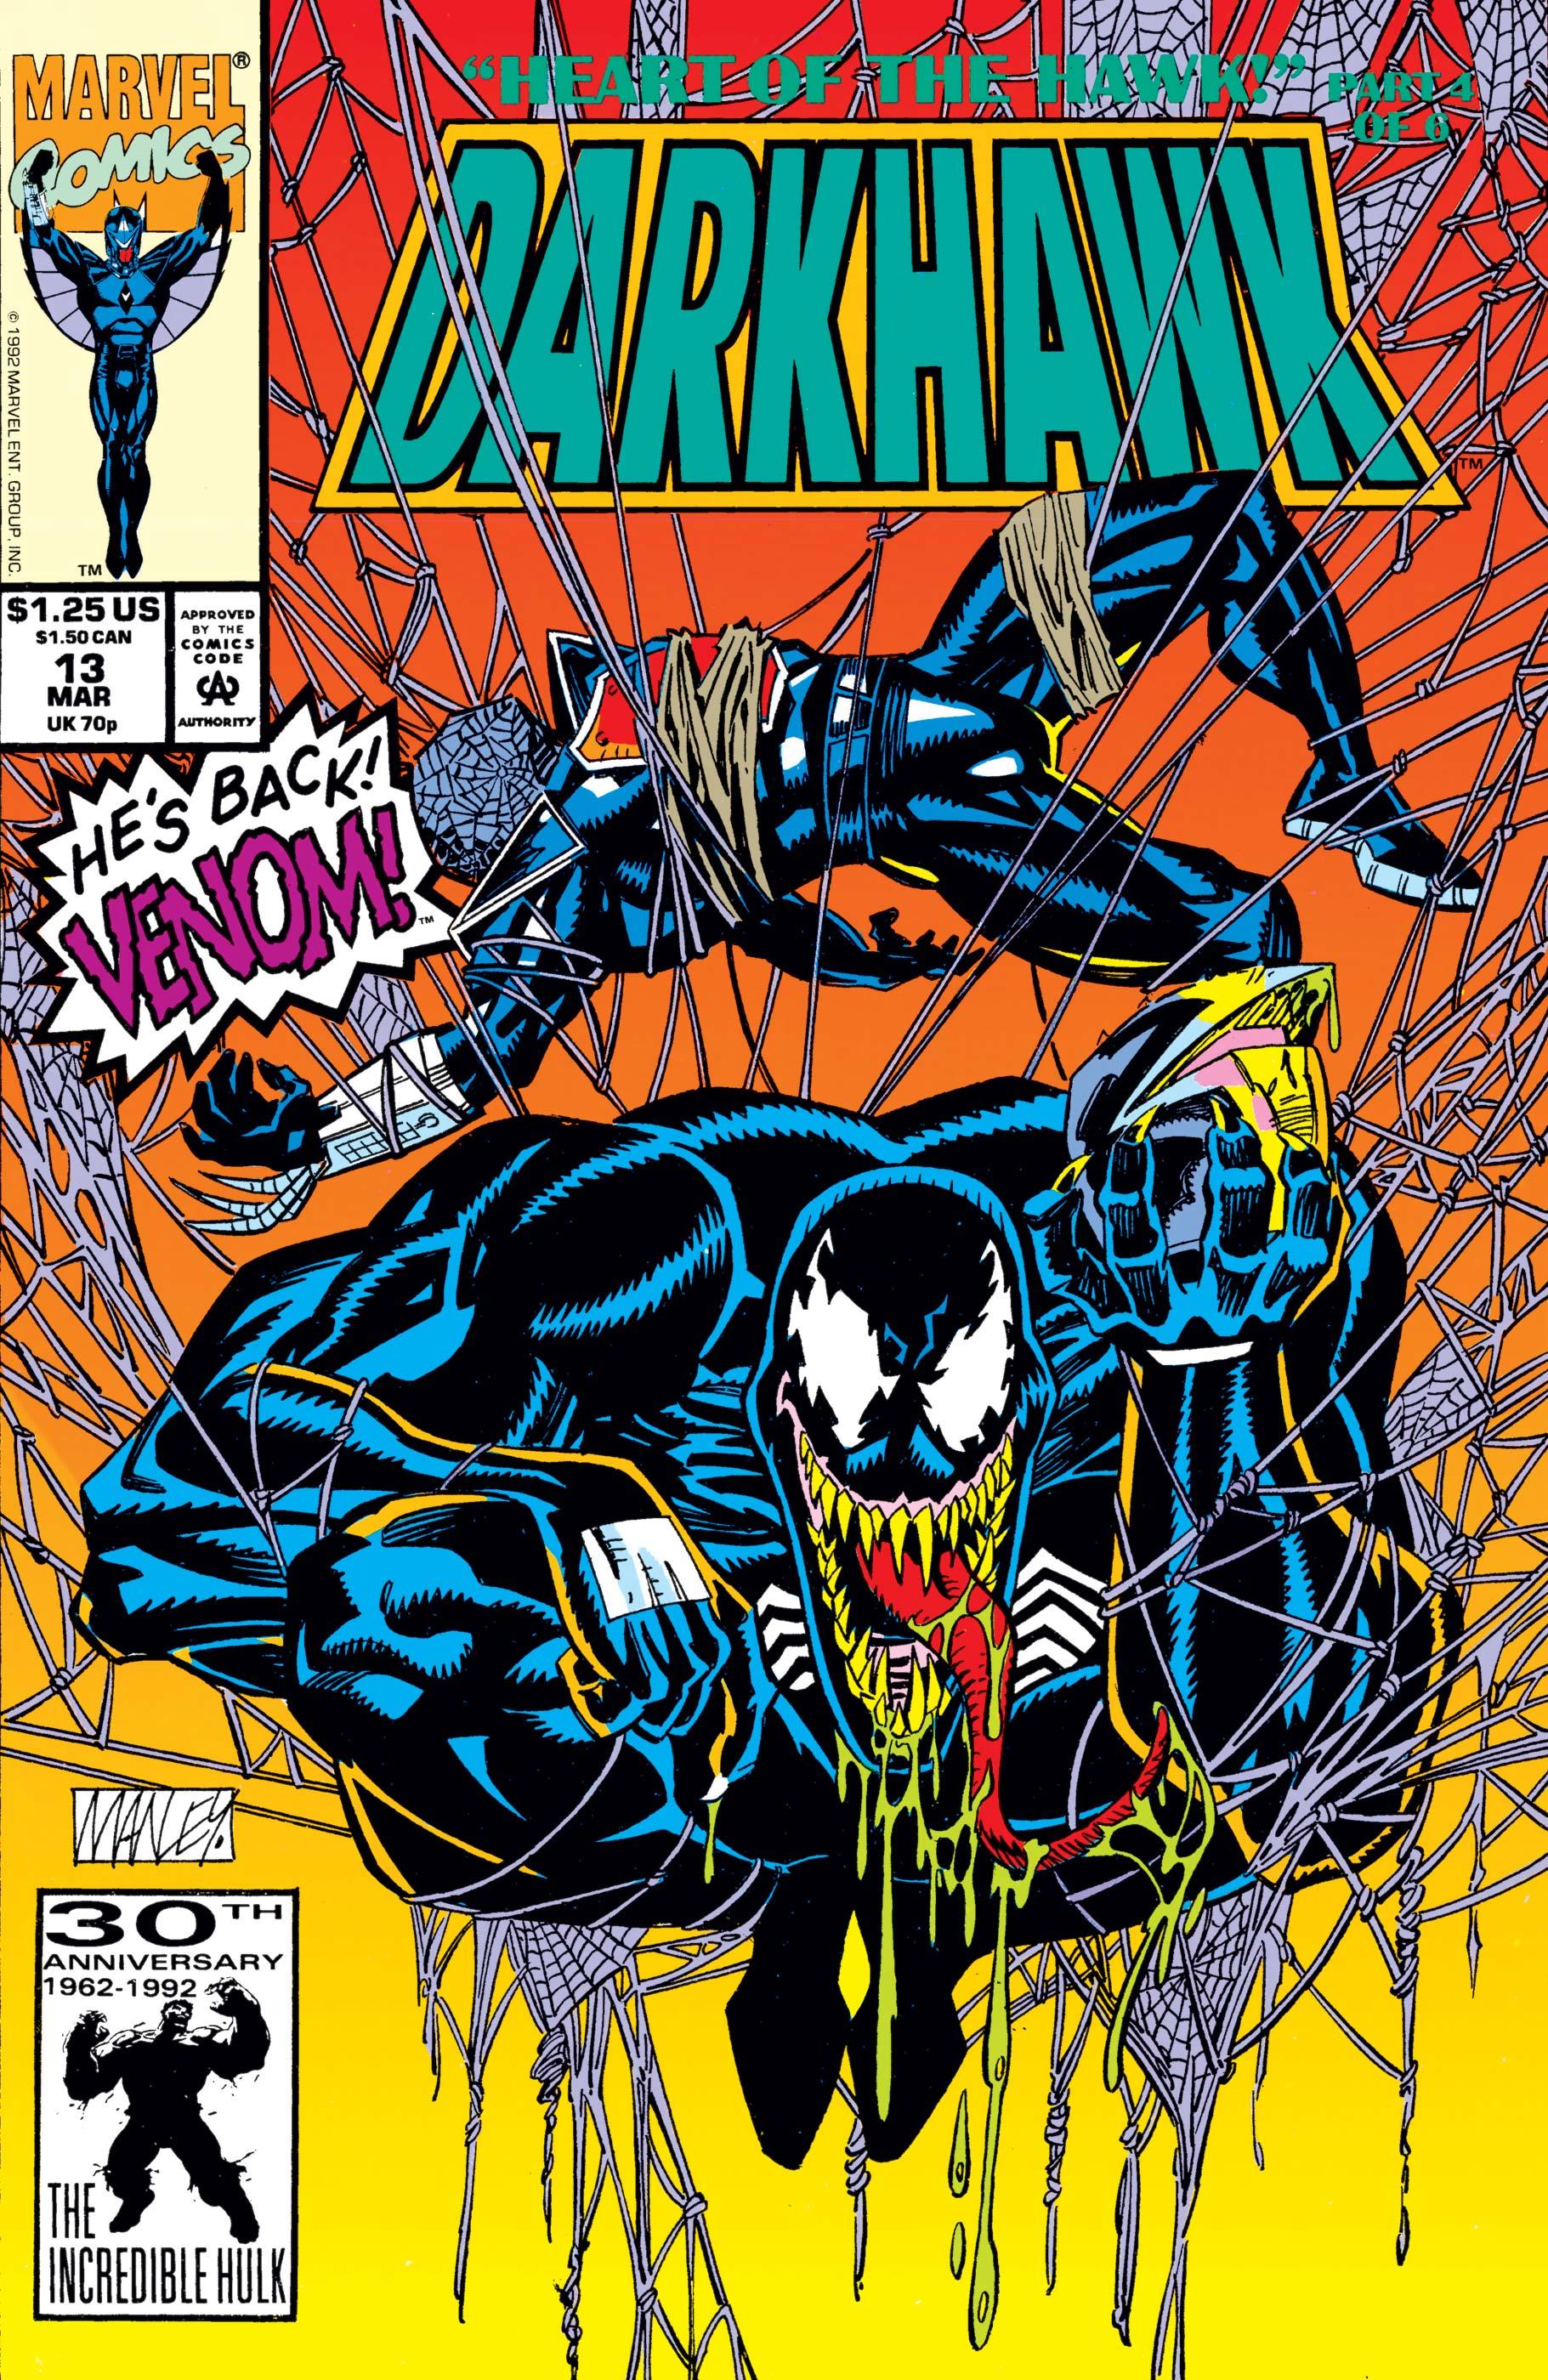 MARVEL COMICS DARKHAWK #13